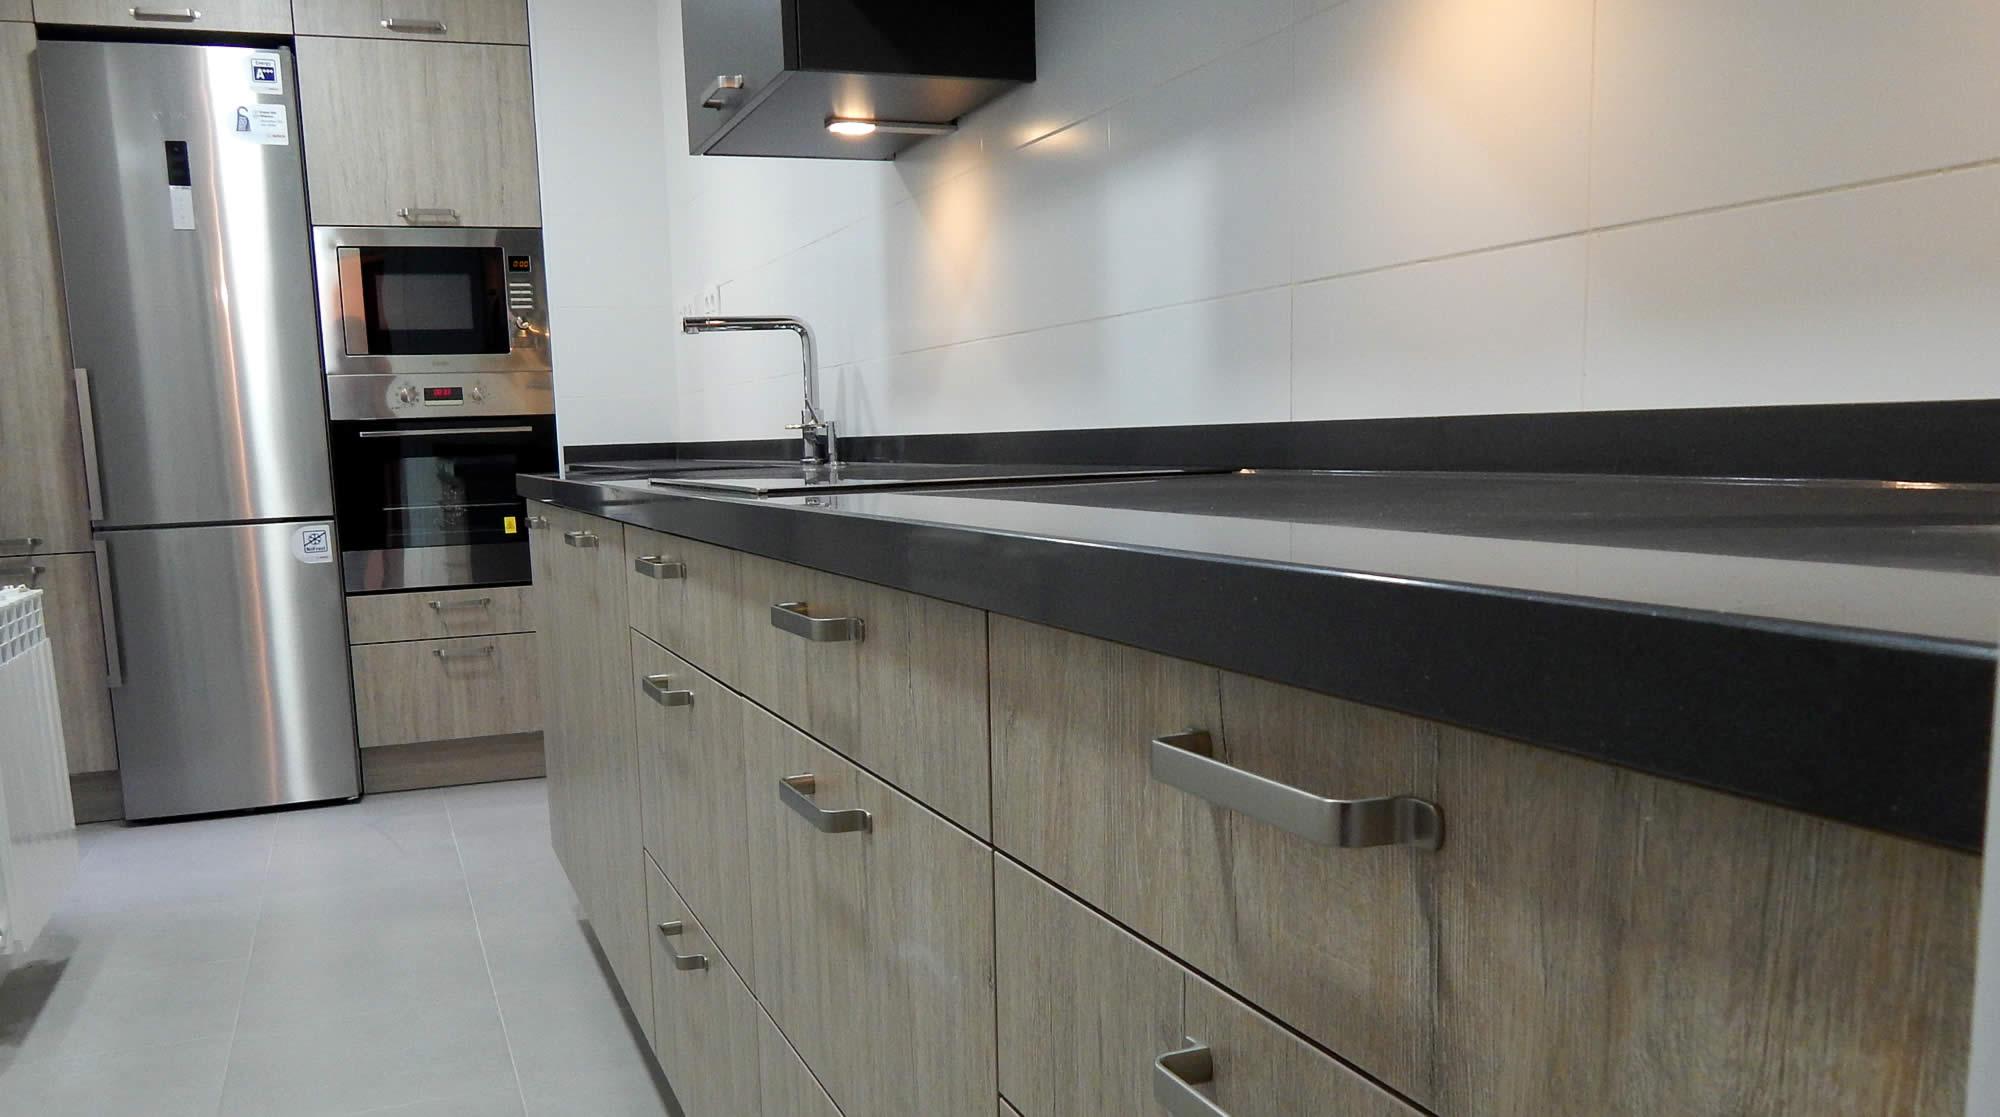 Muebles de cocina modelo bali for Muebles de cocina gris